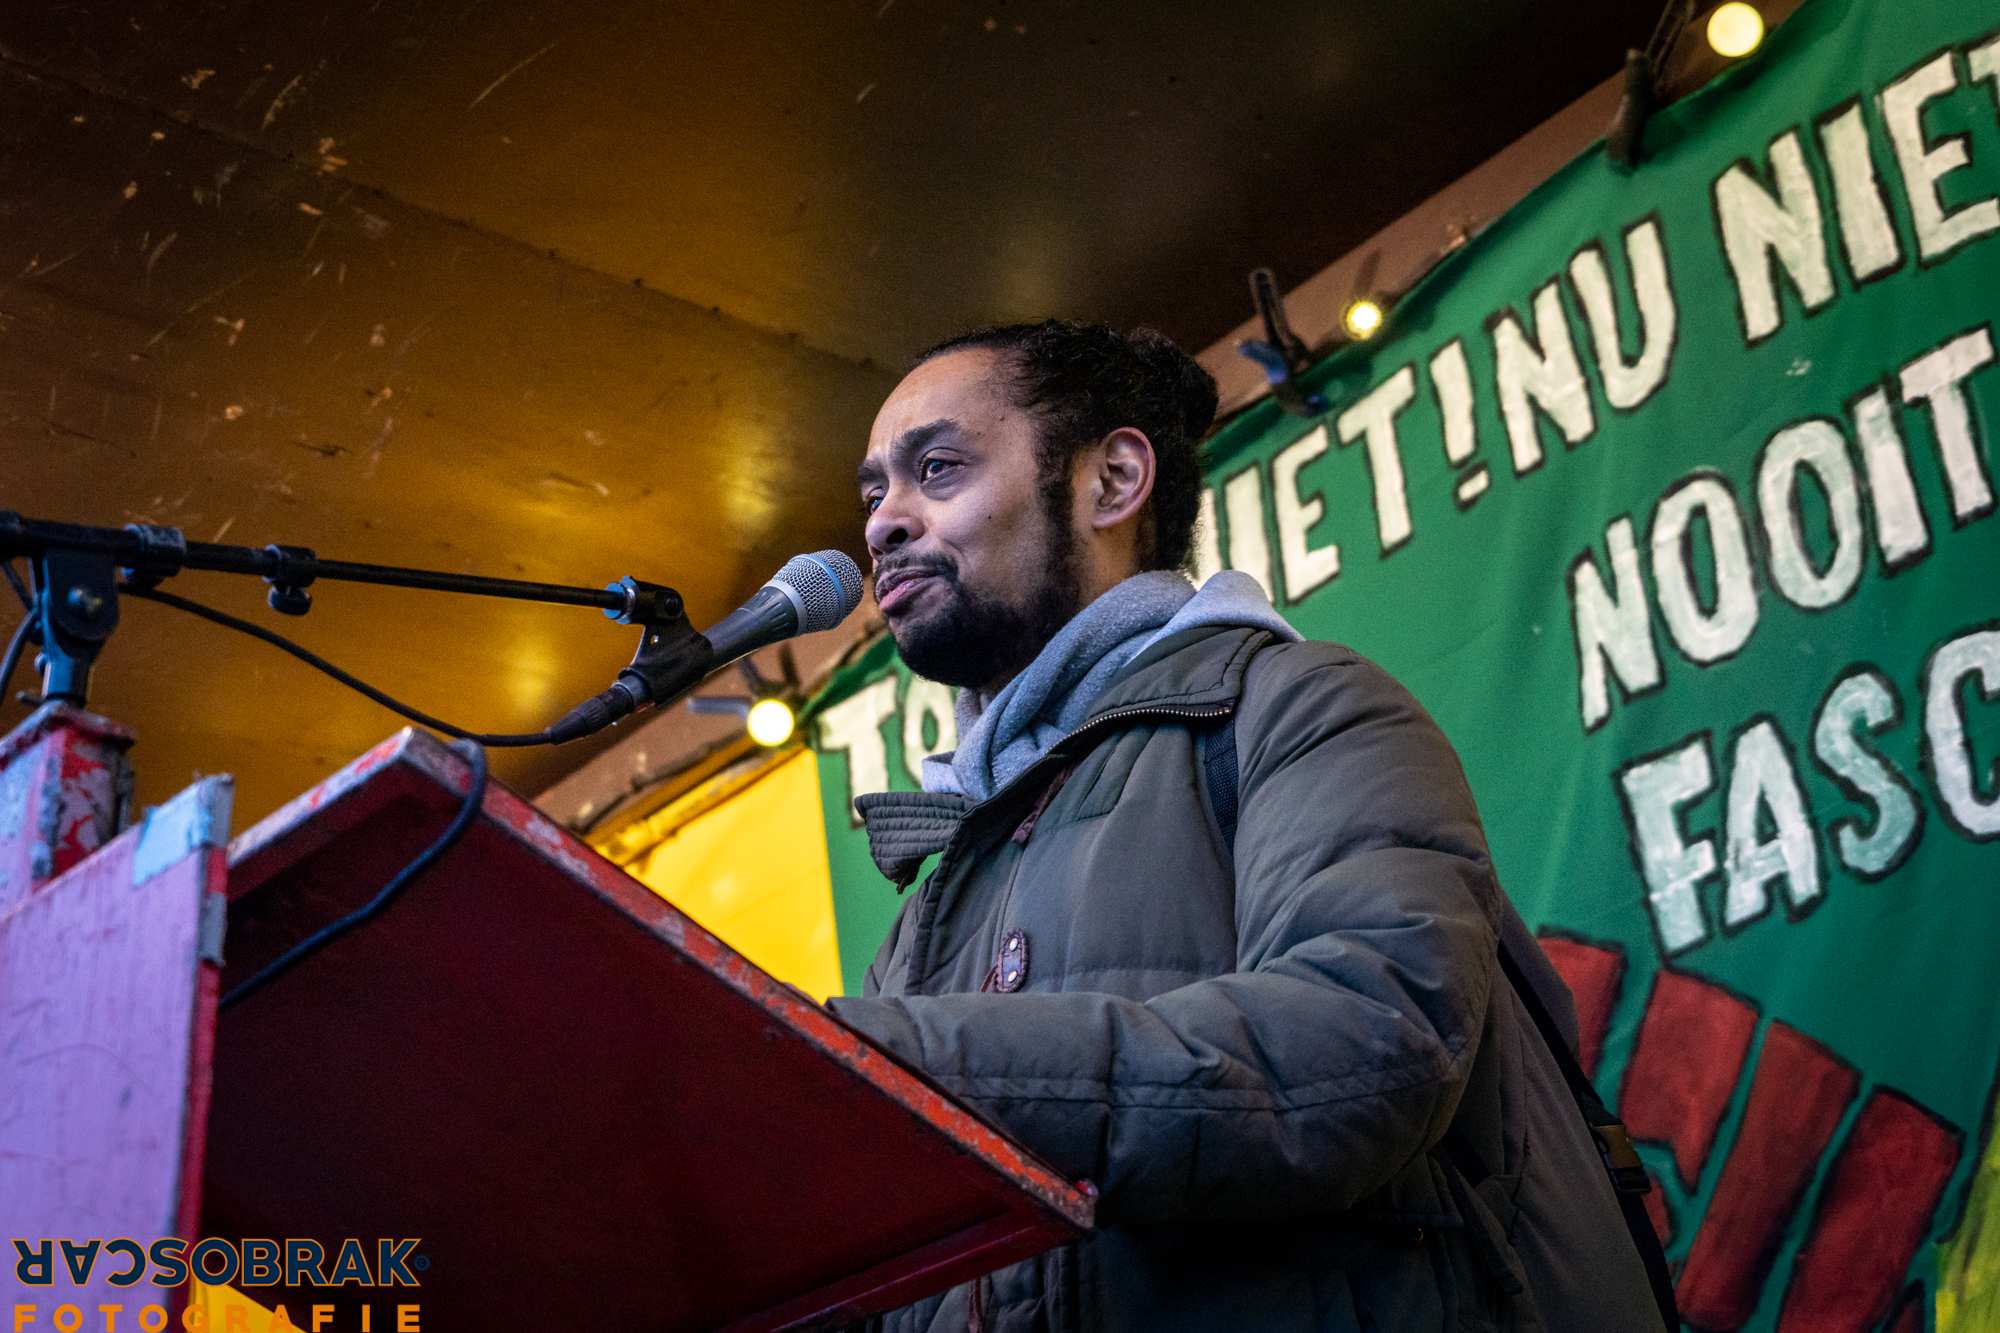 nooit meer fascisme demo westerpark amsterdam oscar brak fotografie